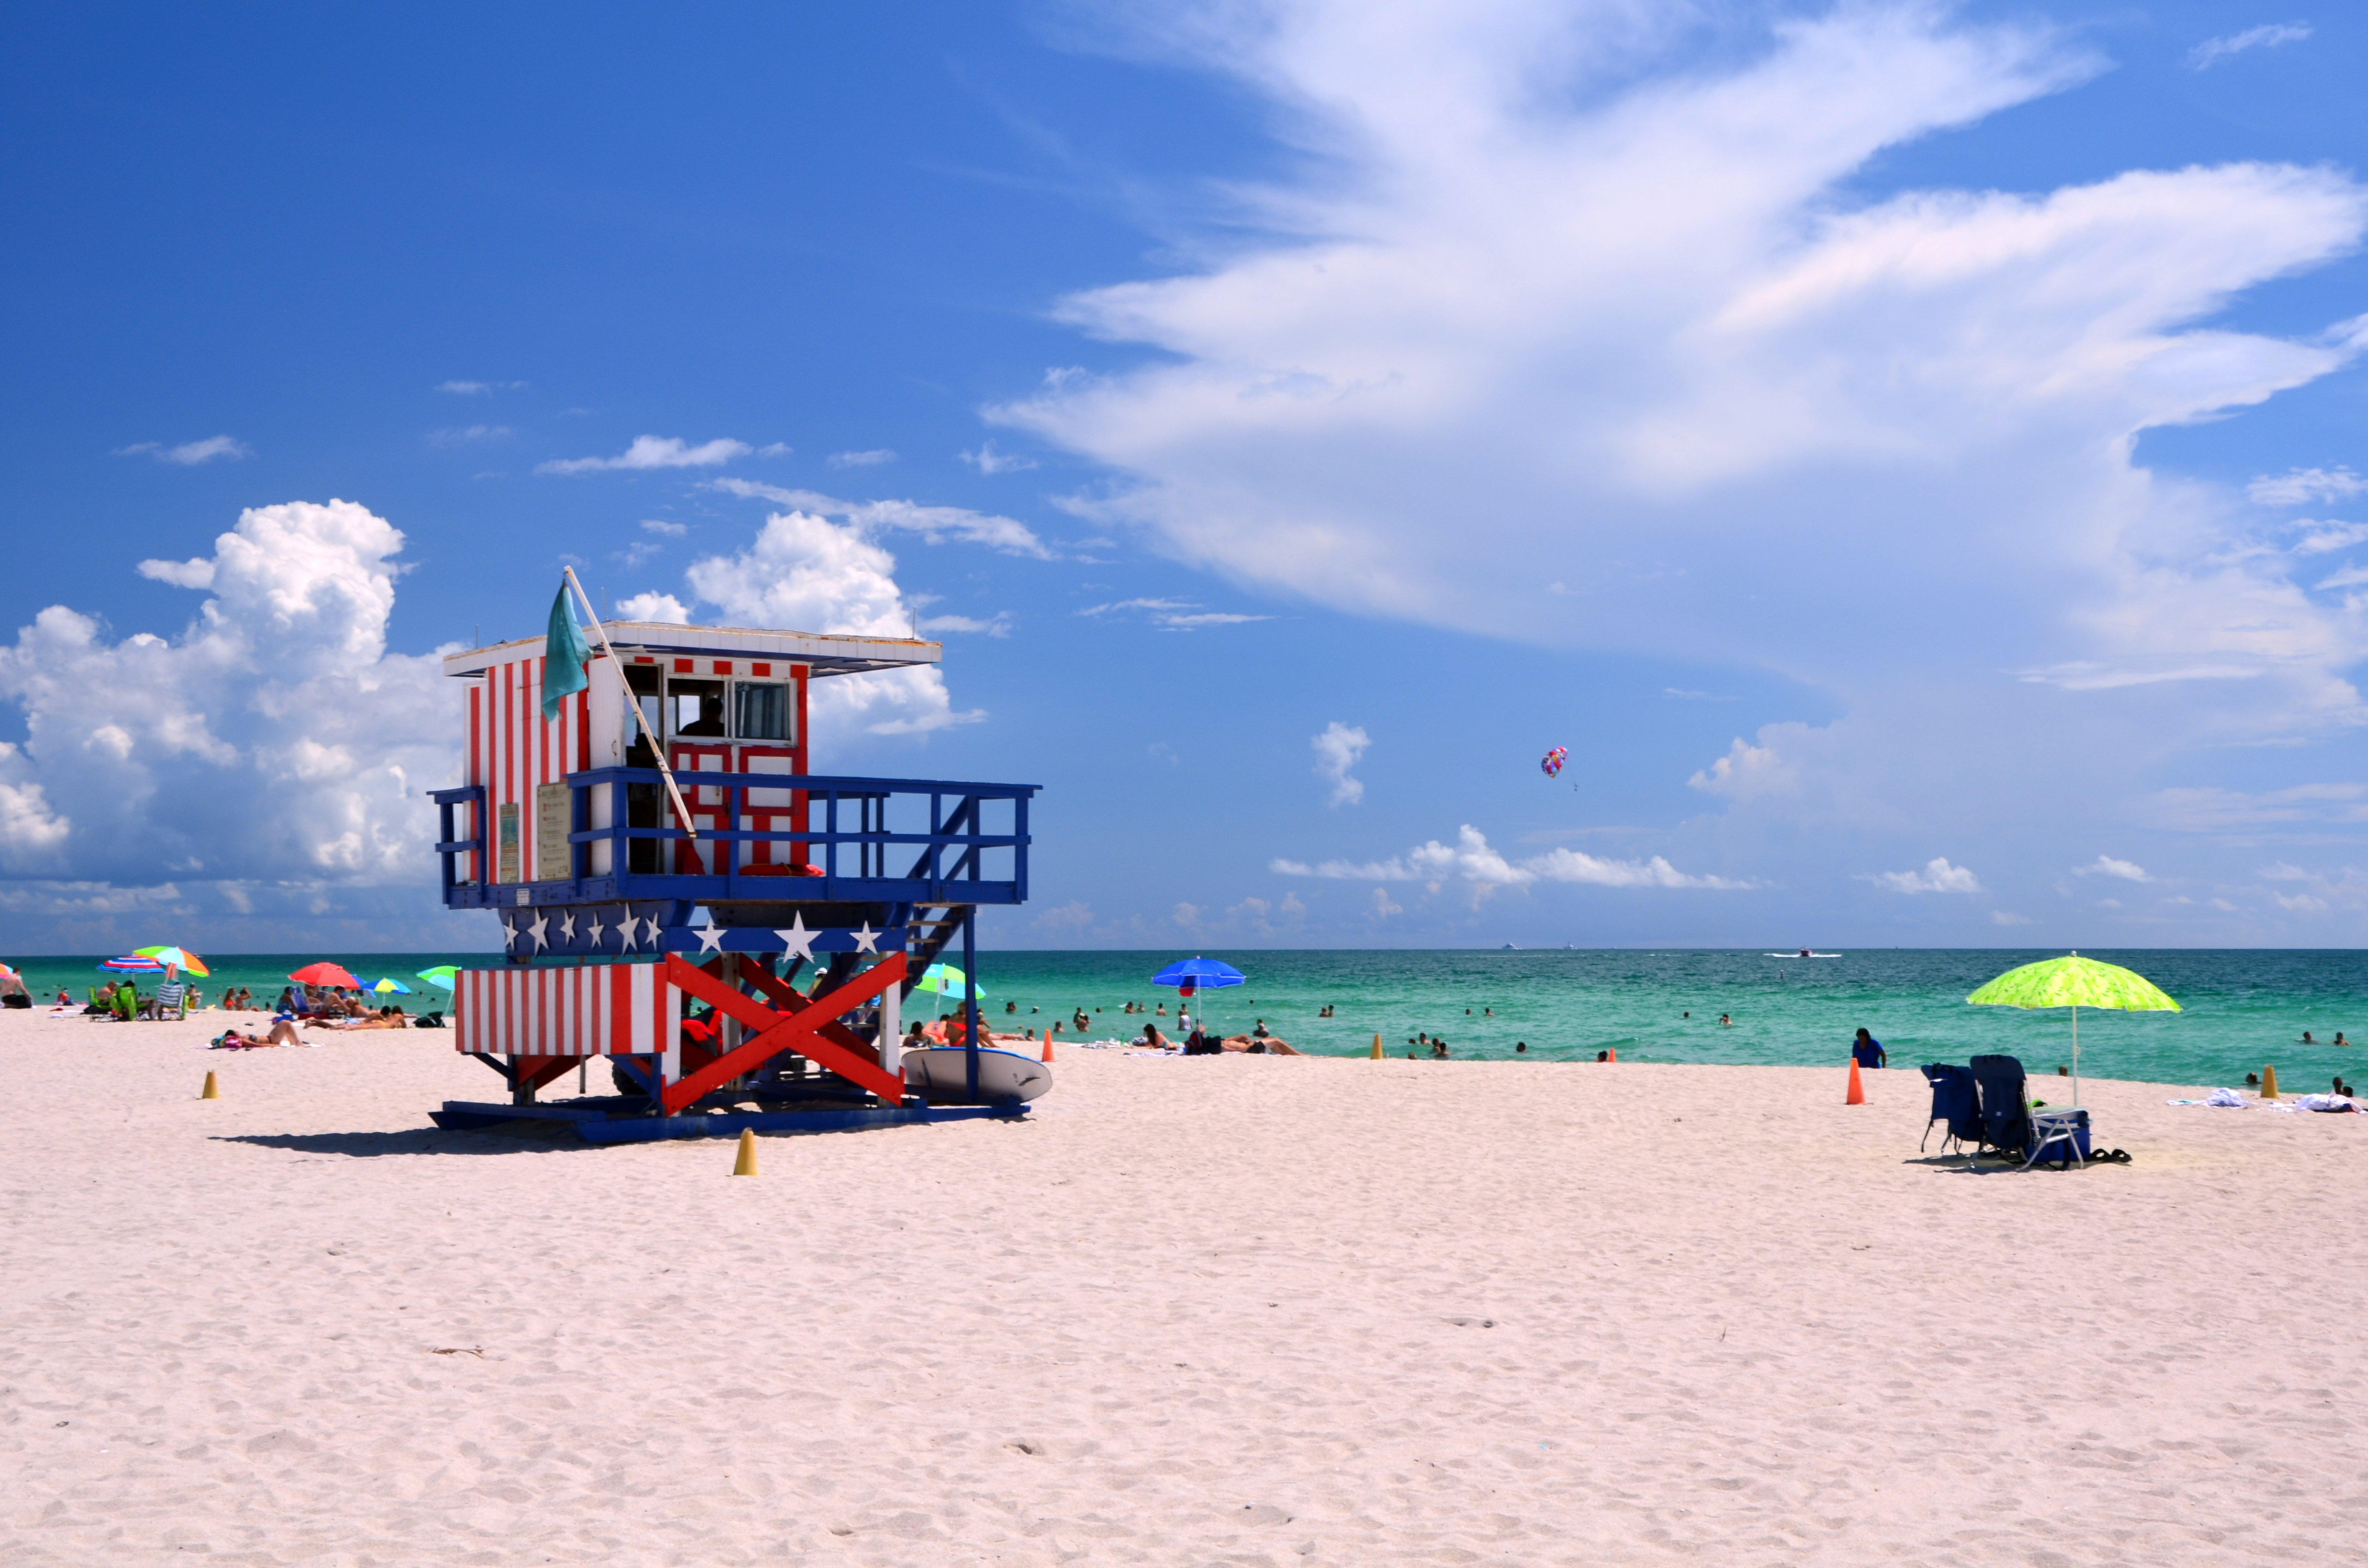 South Beach, Miami FL July 20 23 2012